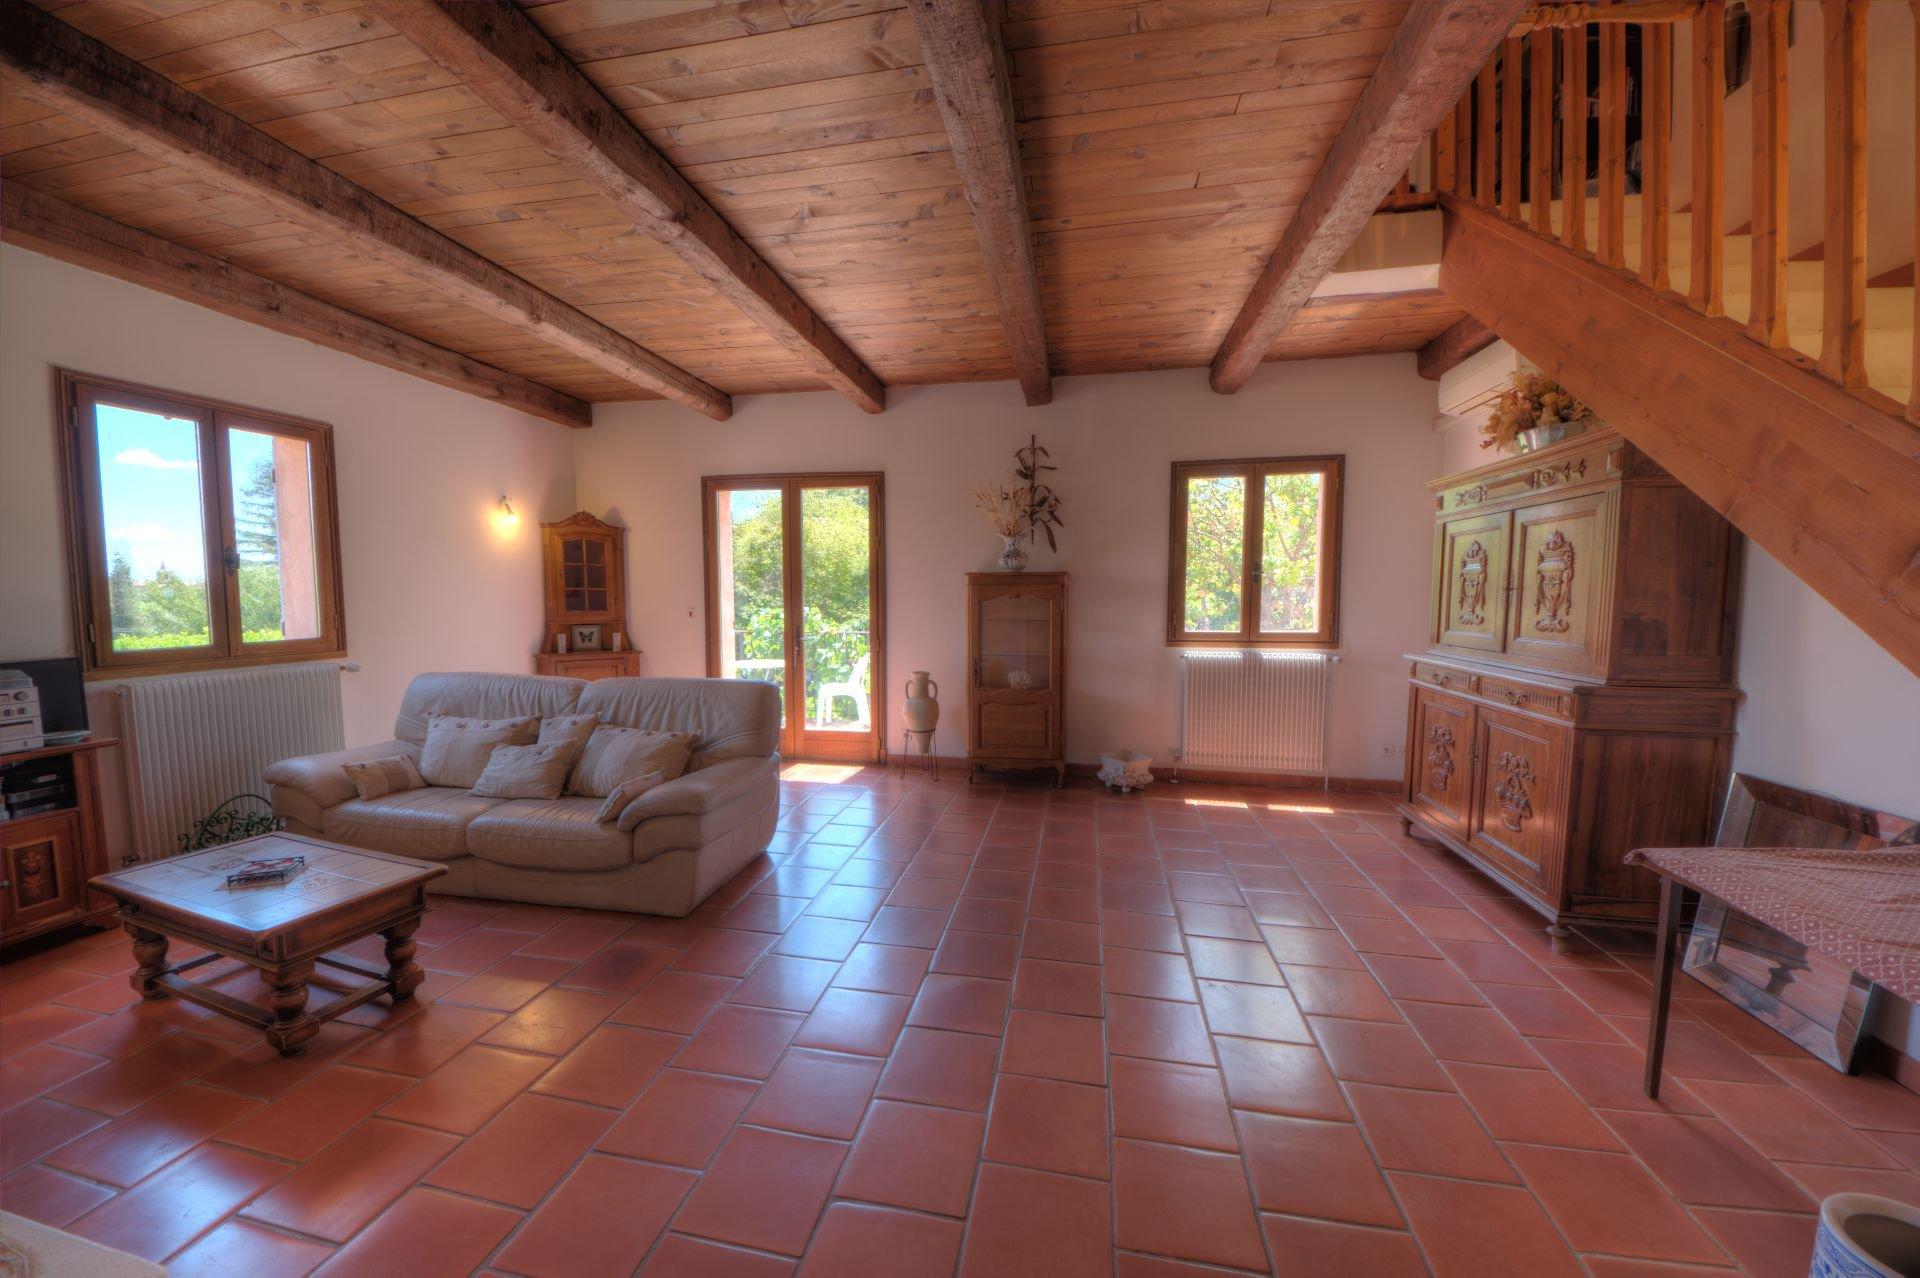 Traditional construction 170 m² on 1170 m² fenced, Régusse, Var, Provence